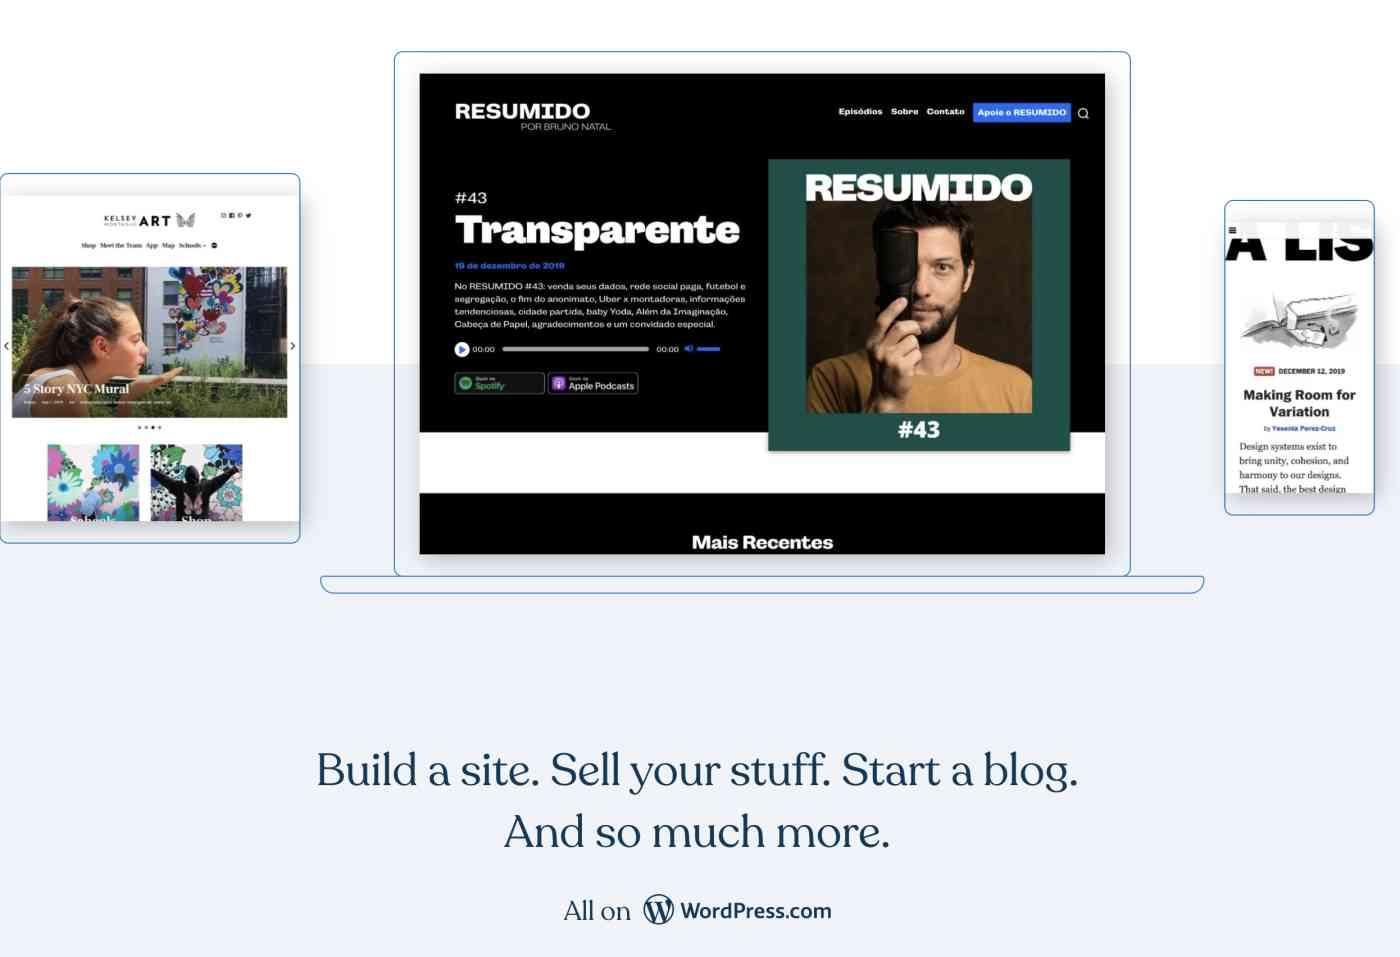 Setting up a website at WordPress.com